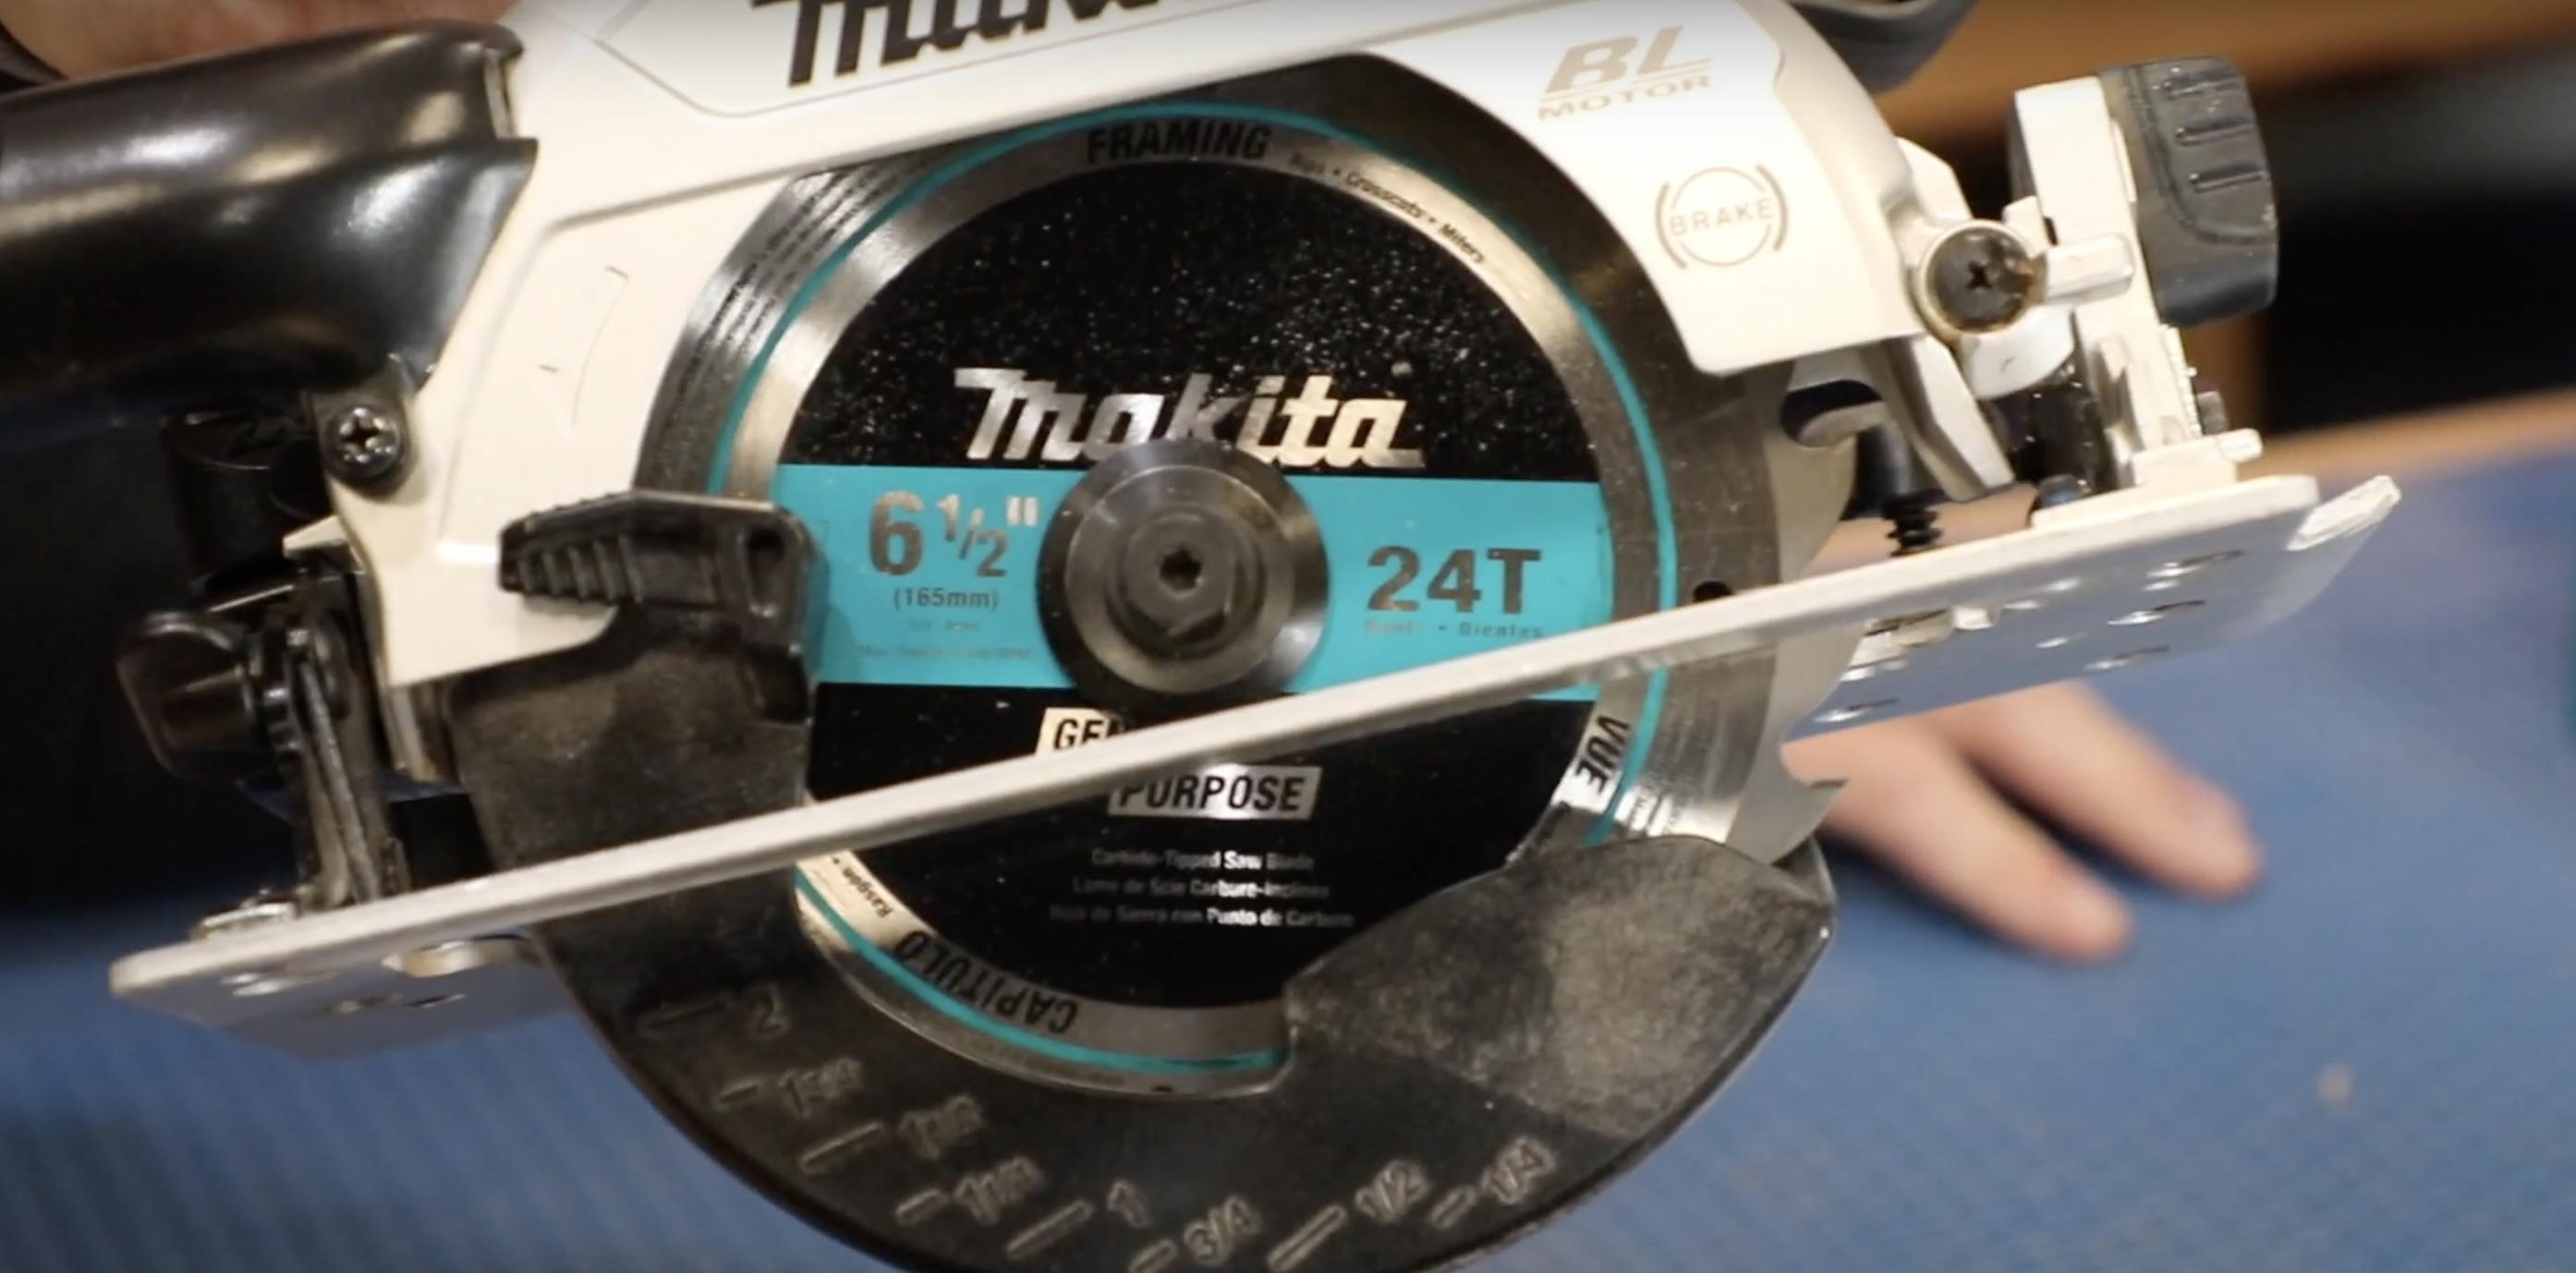 6.5 inch circular saw